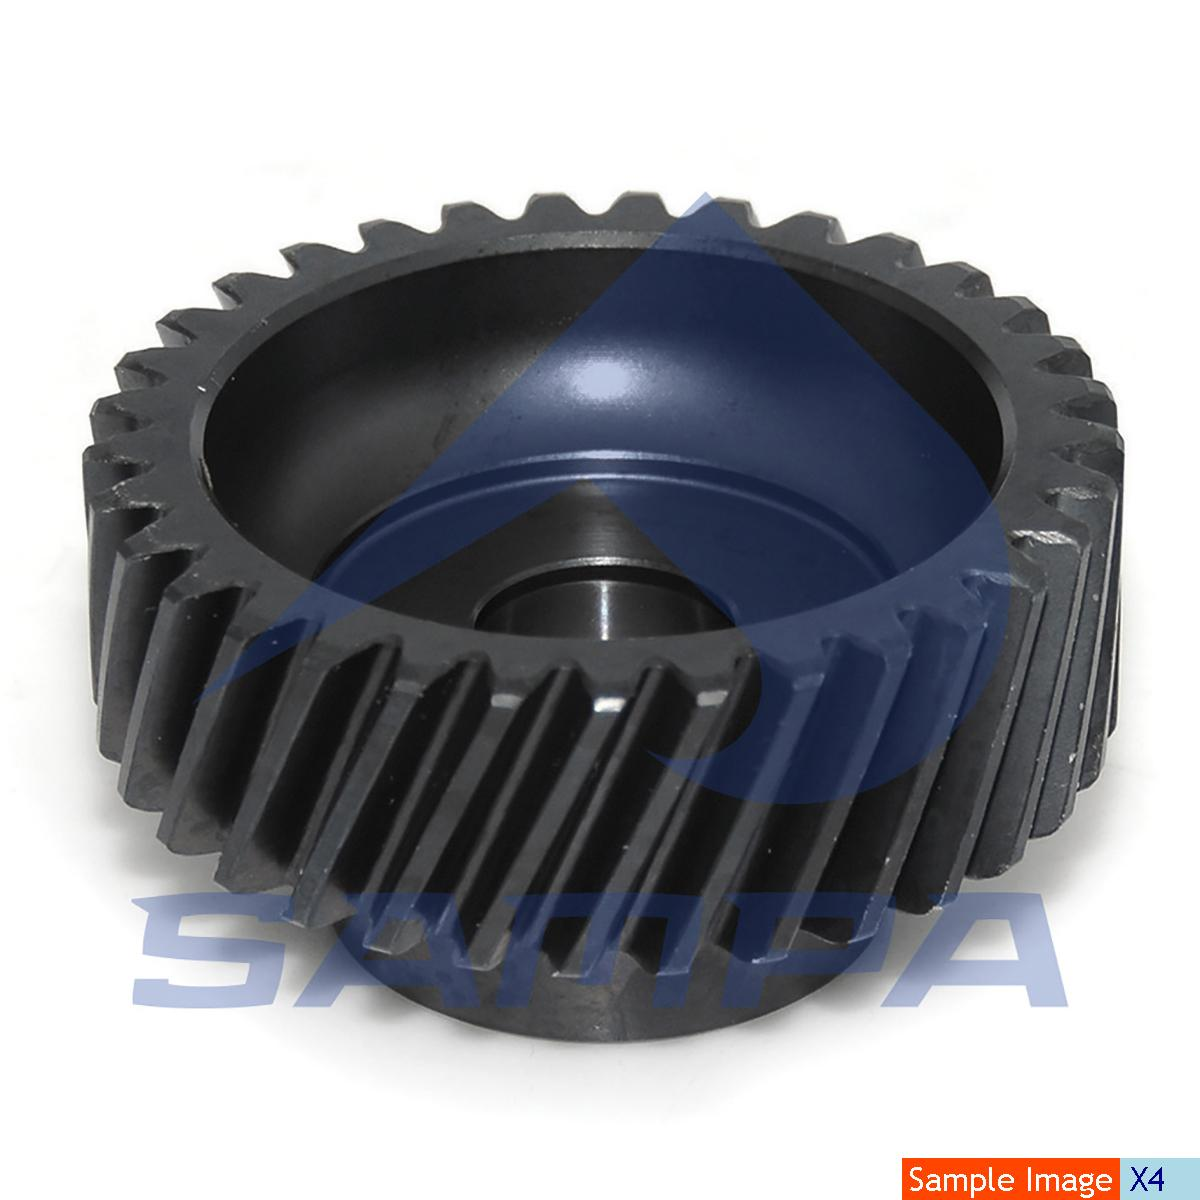 Gear, Compressor, Man, Compressed Air System